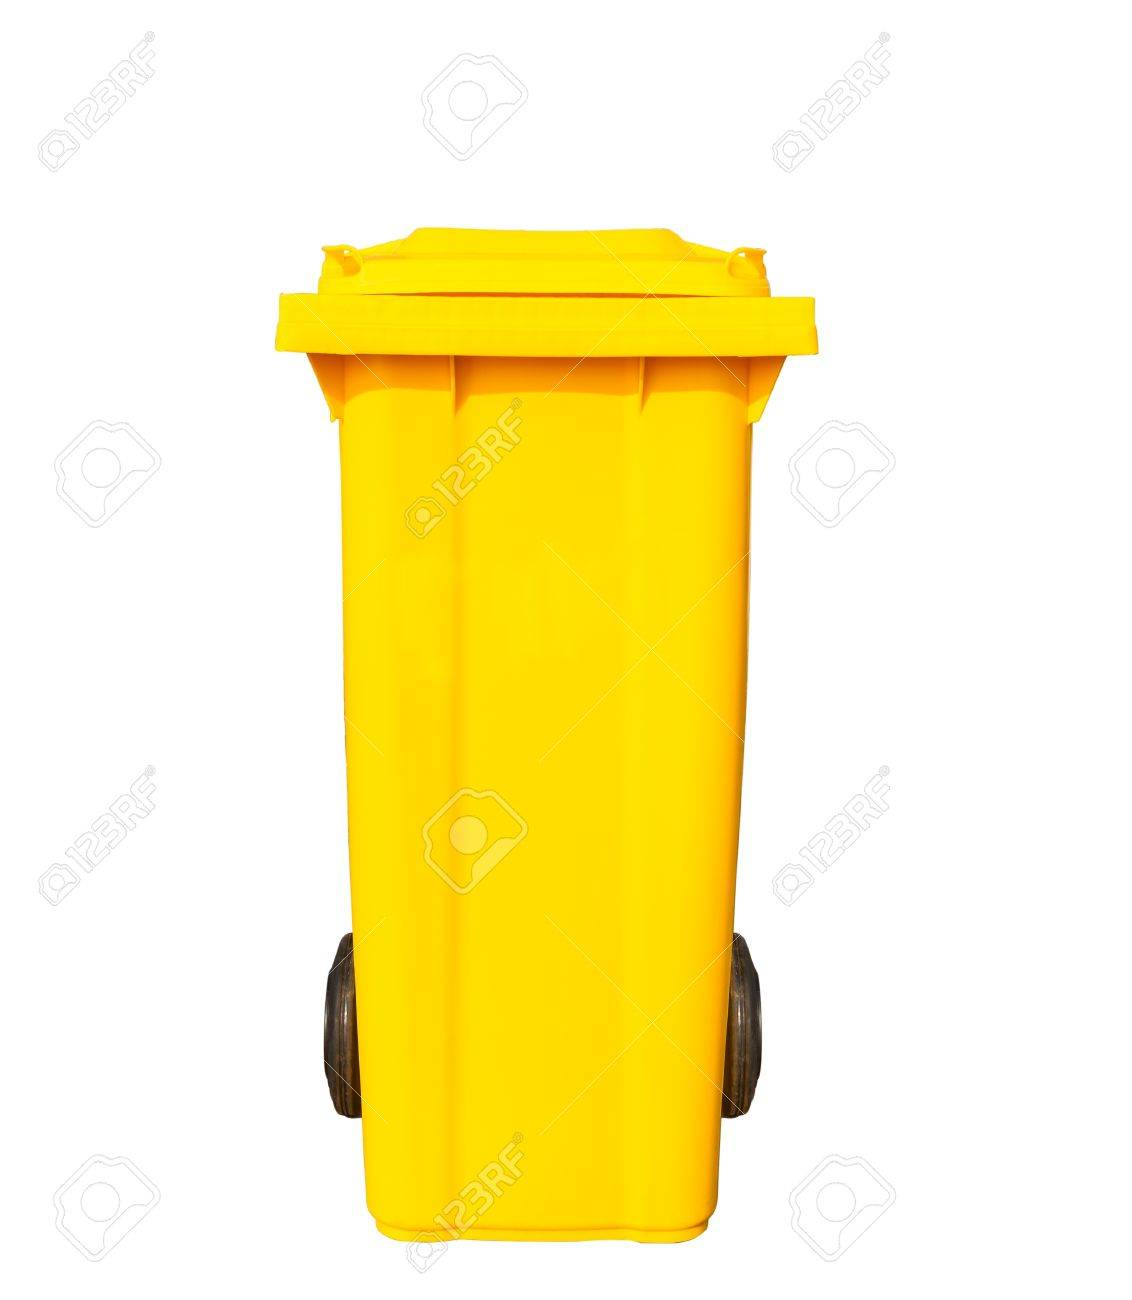 big yellow garbage bin or trash can with black wheels stock photo